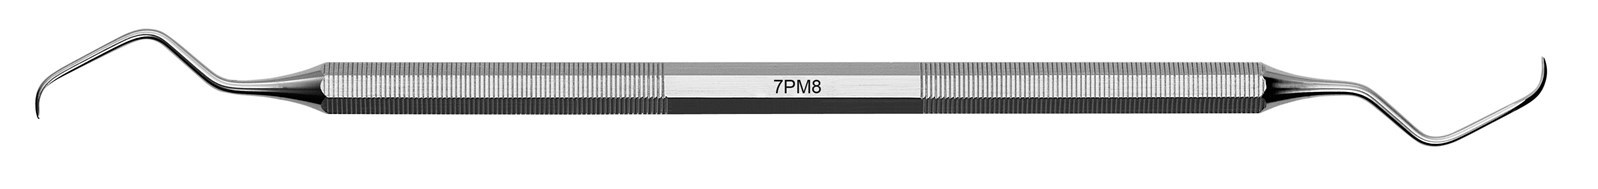 Kyreta Gracey Mini - 7PM8, ADEP světle modrý